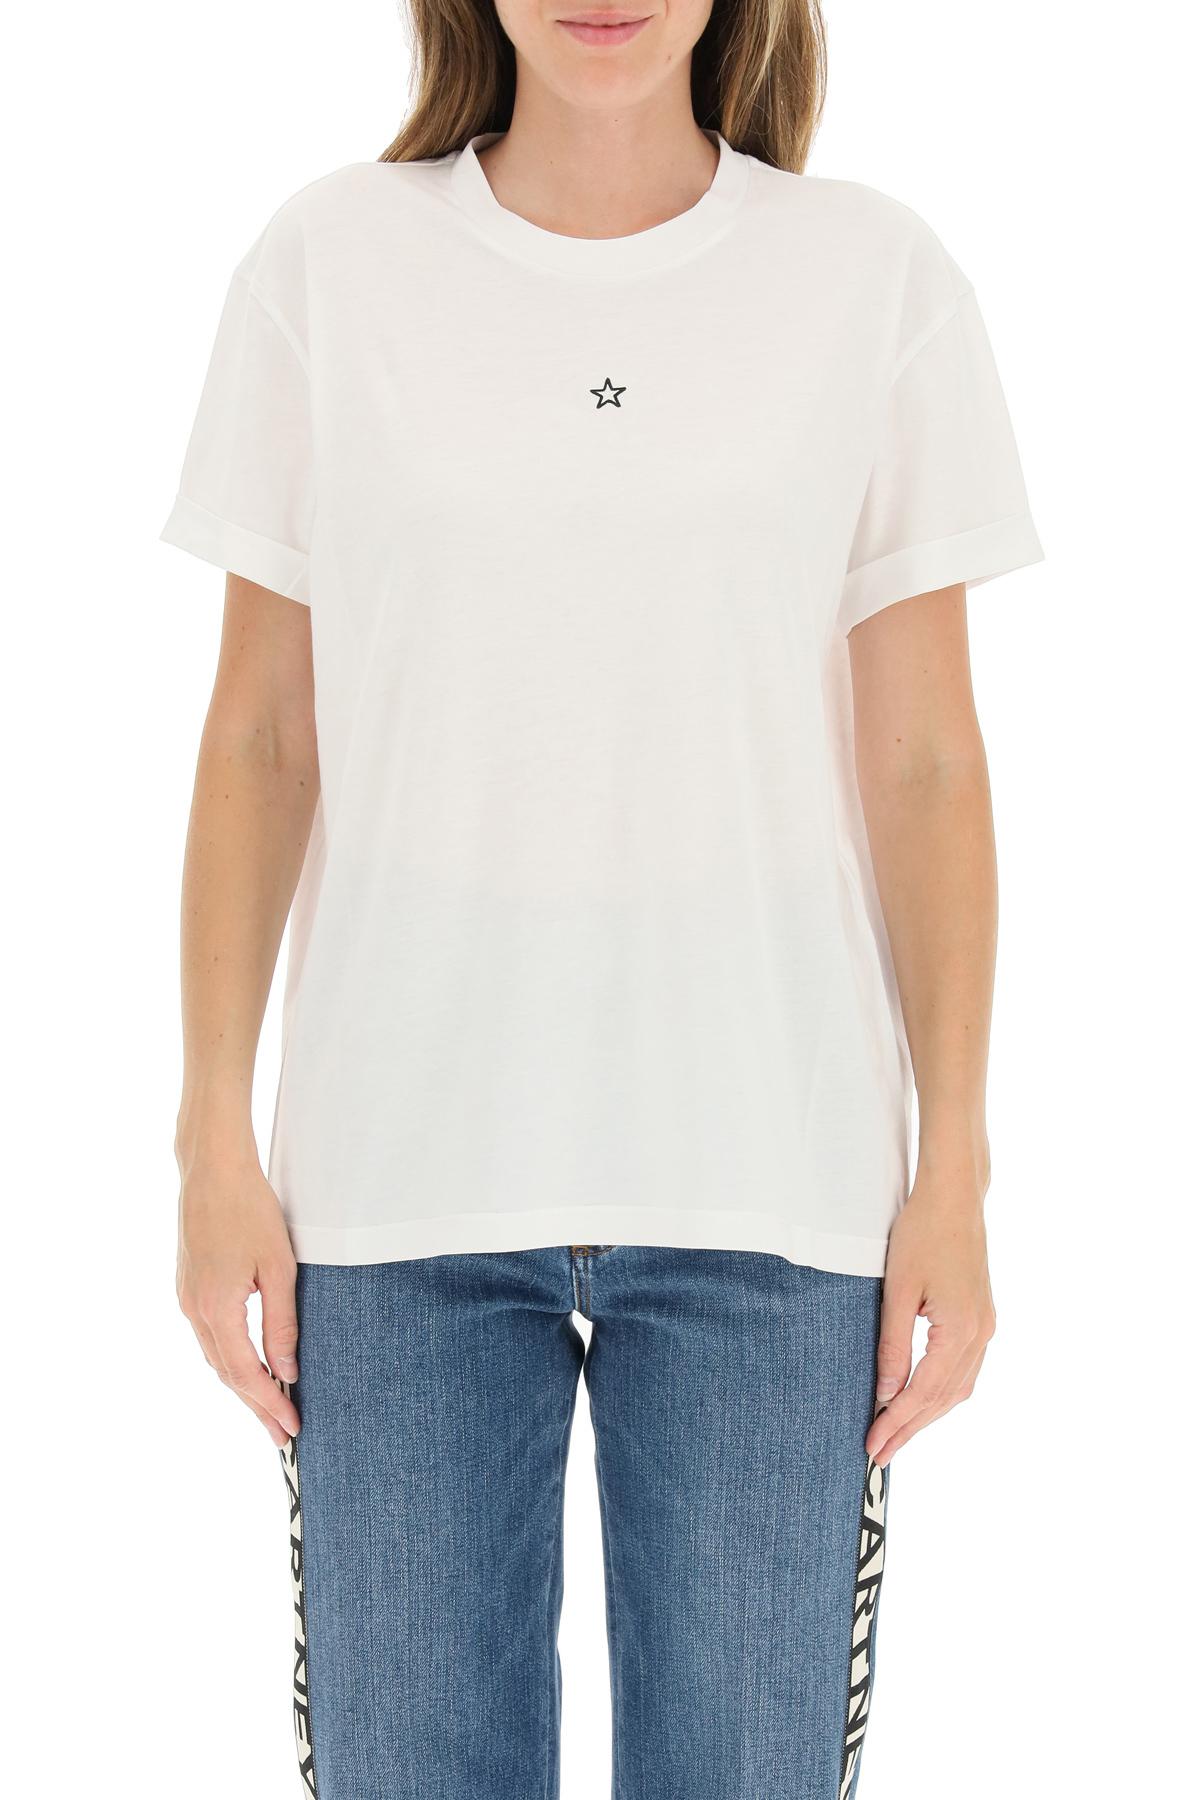 Stella mccartney t-shirt ricamo ministar